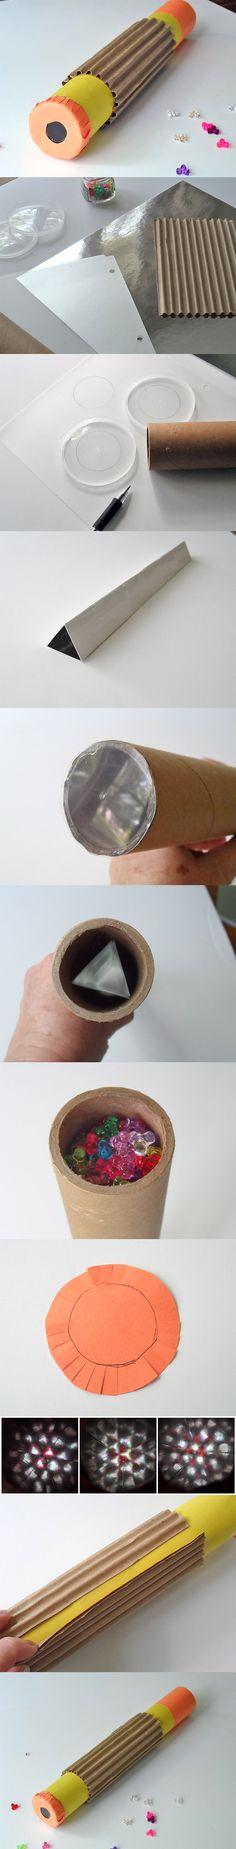 caleidoscopio-diy-muy-ingenioso-1